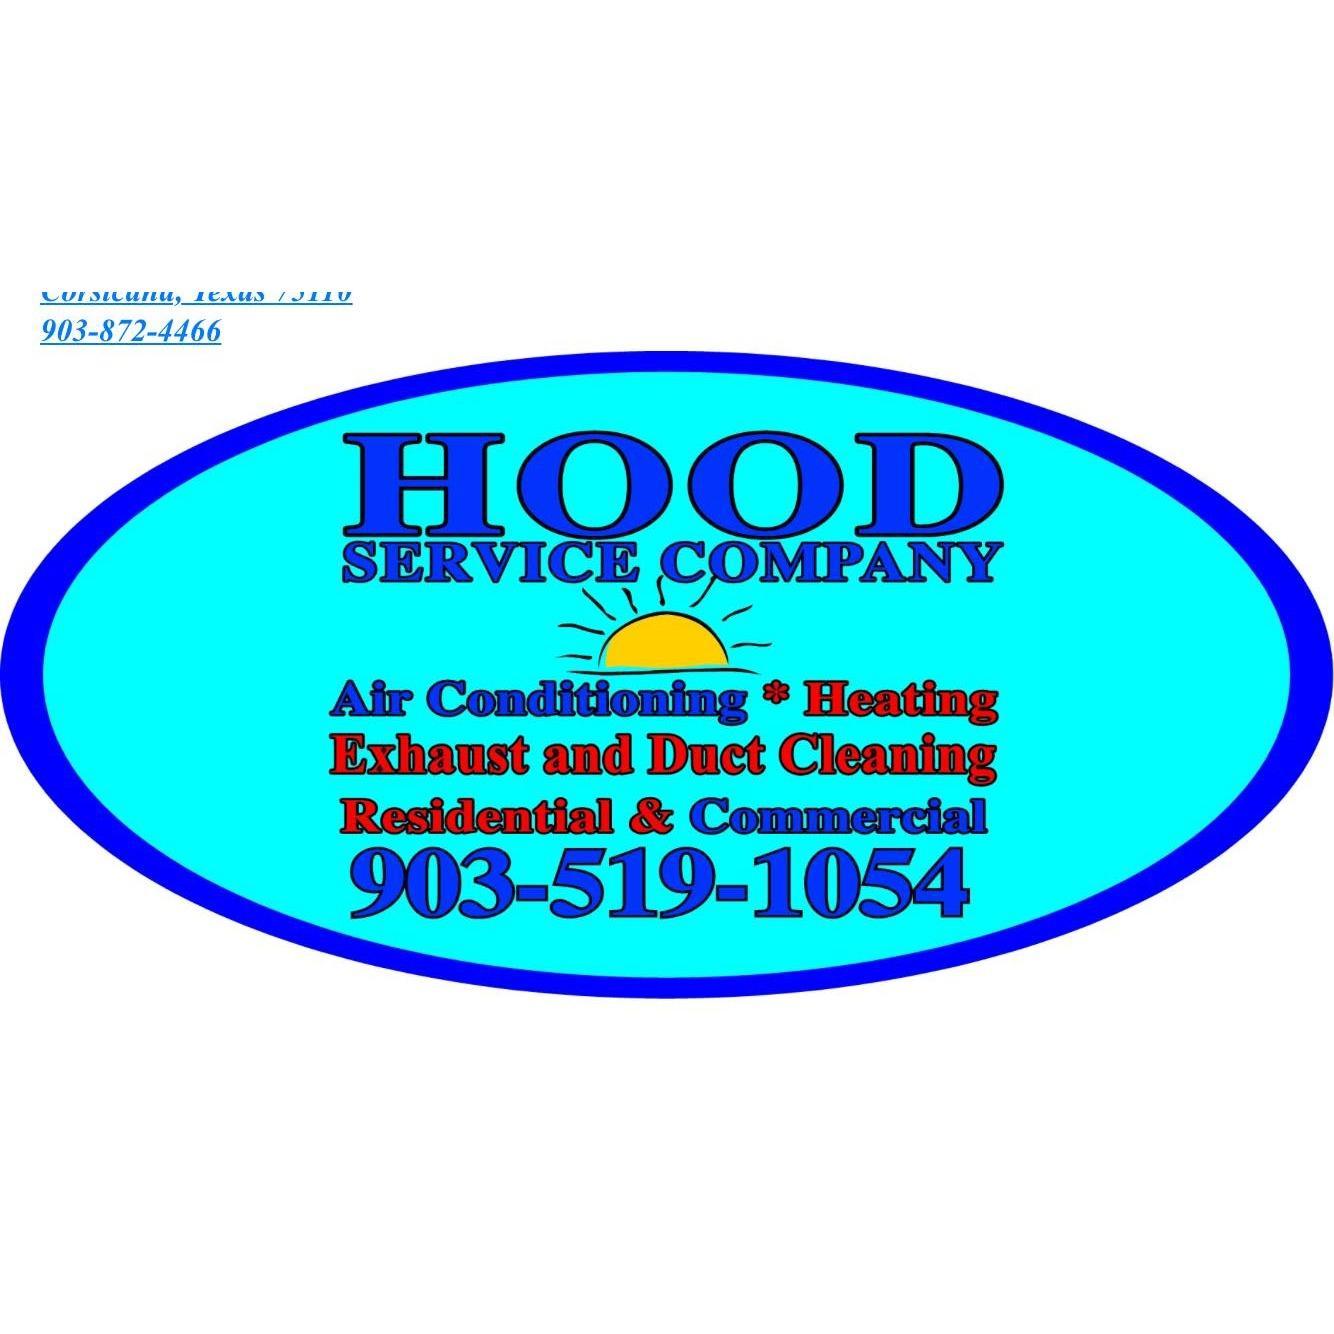 Hood Service Company Air Conditioning & Heating LLC image 4